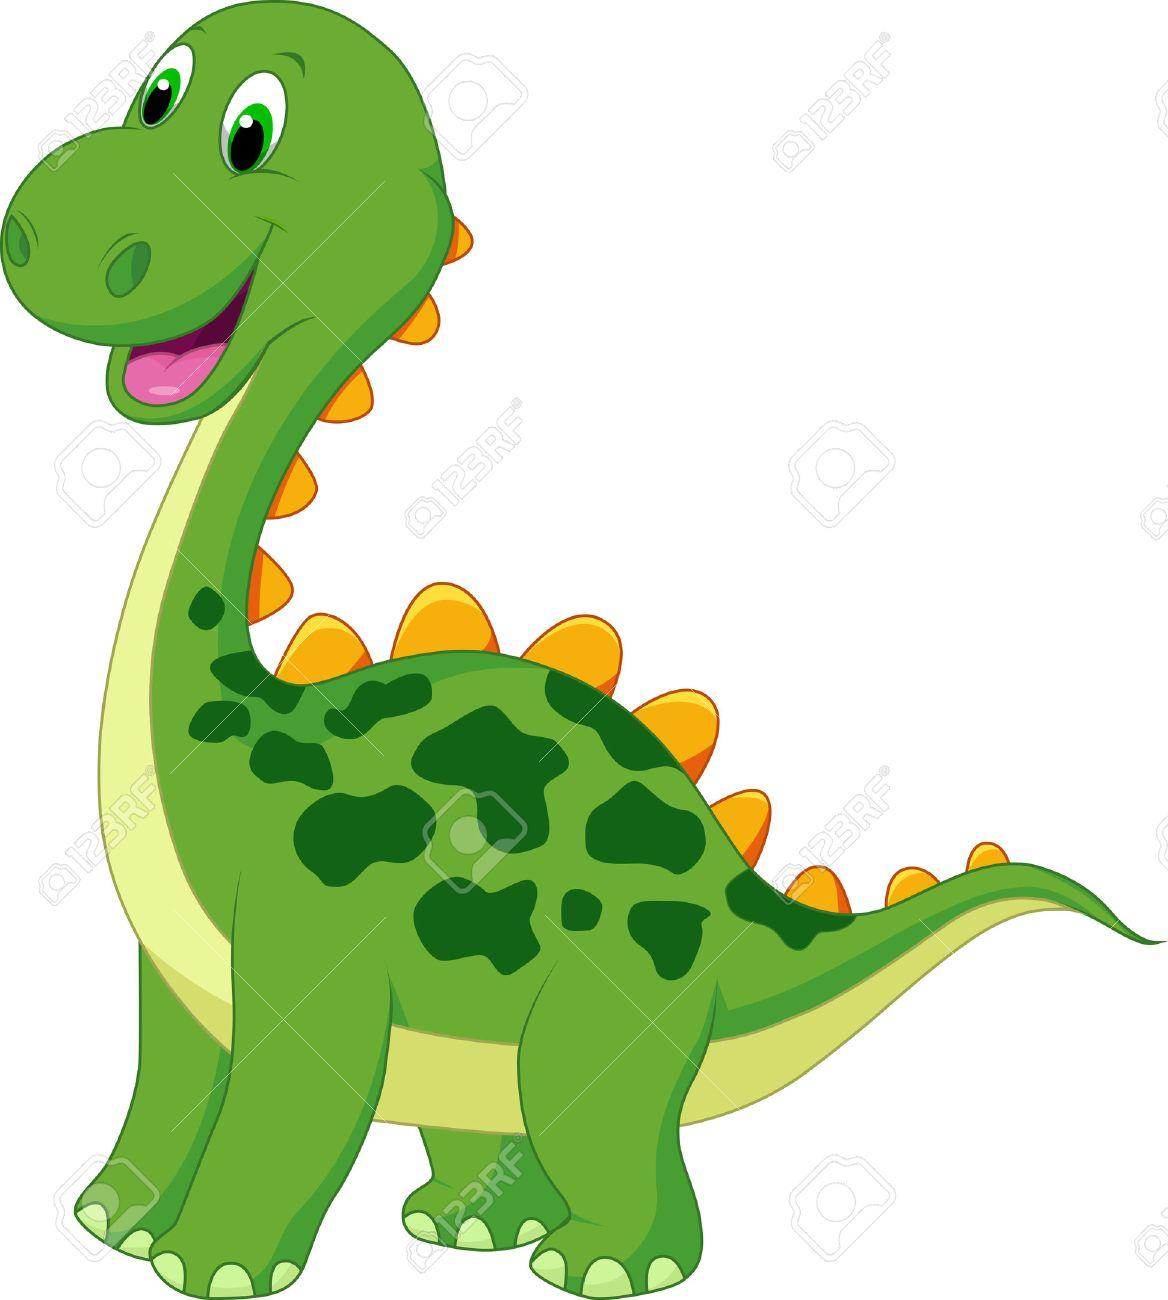 Cute Green Dinosaur Cartoon Royalty Free Cliparts Vectors And Stock Illustration Image 22467069